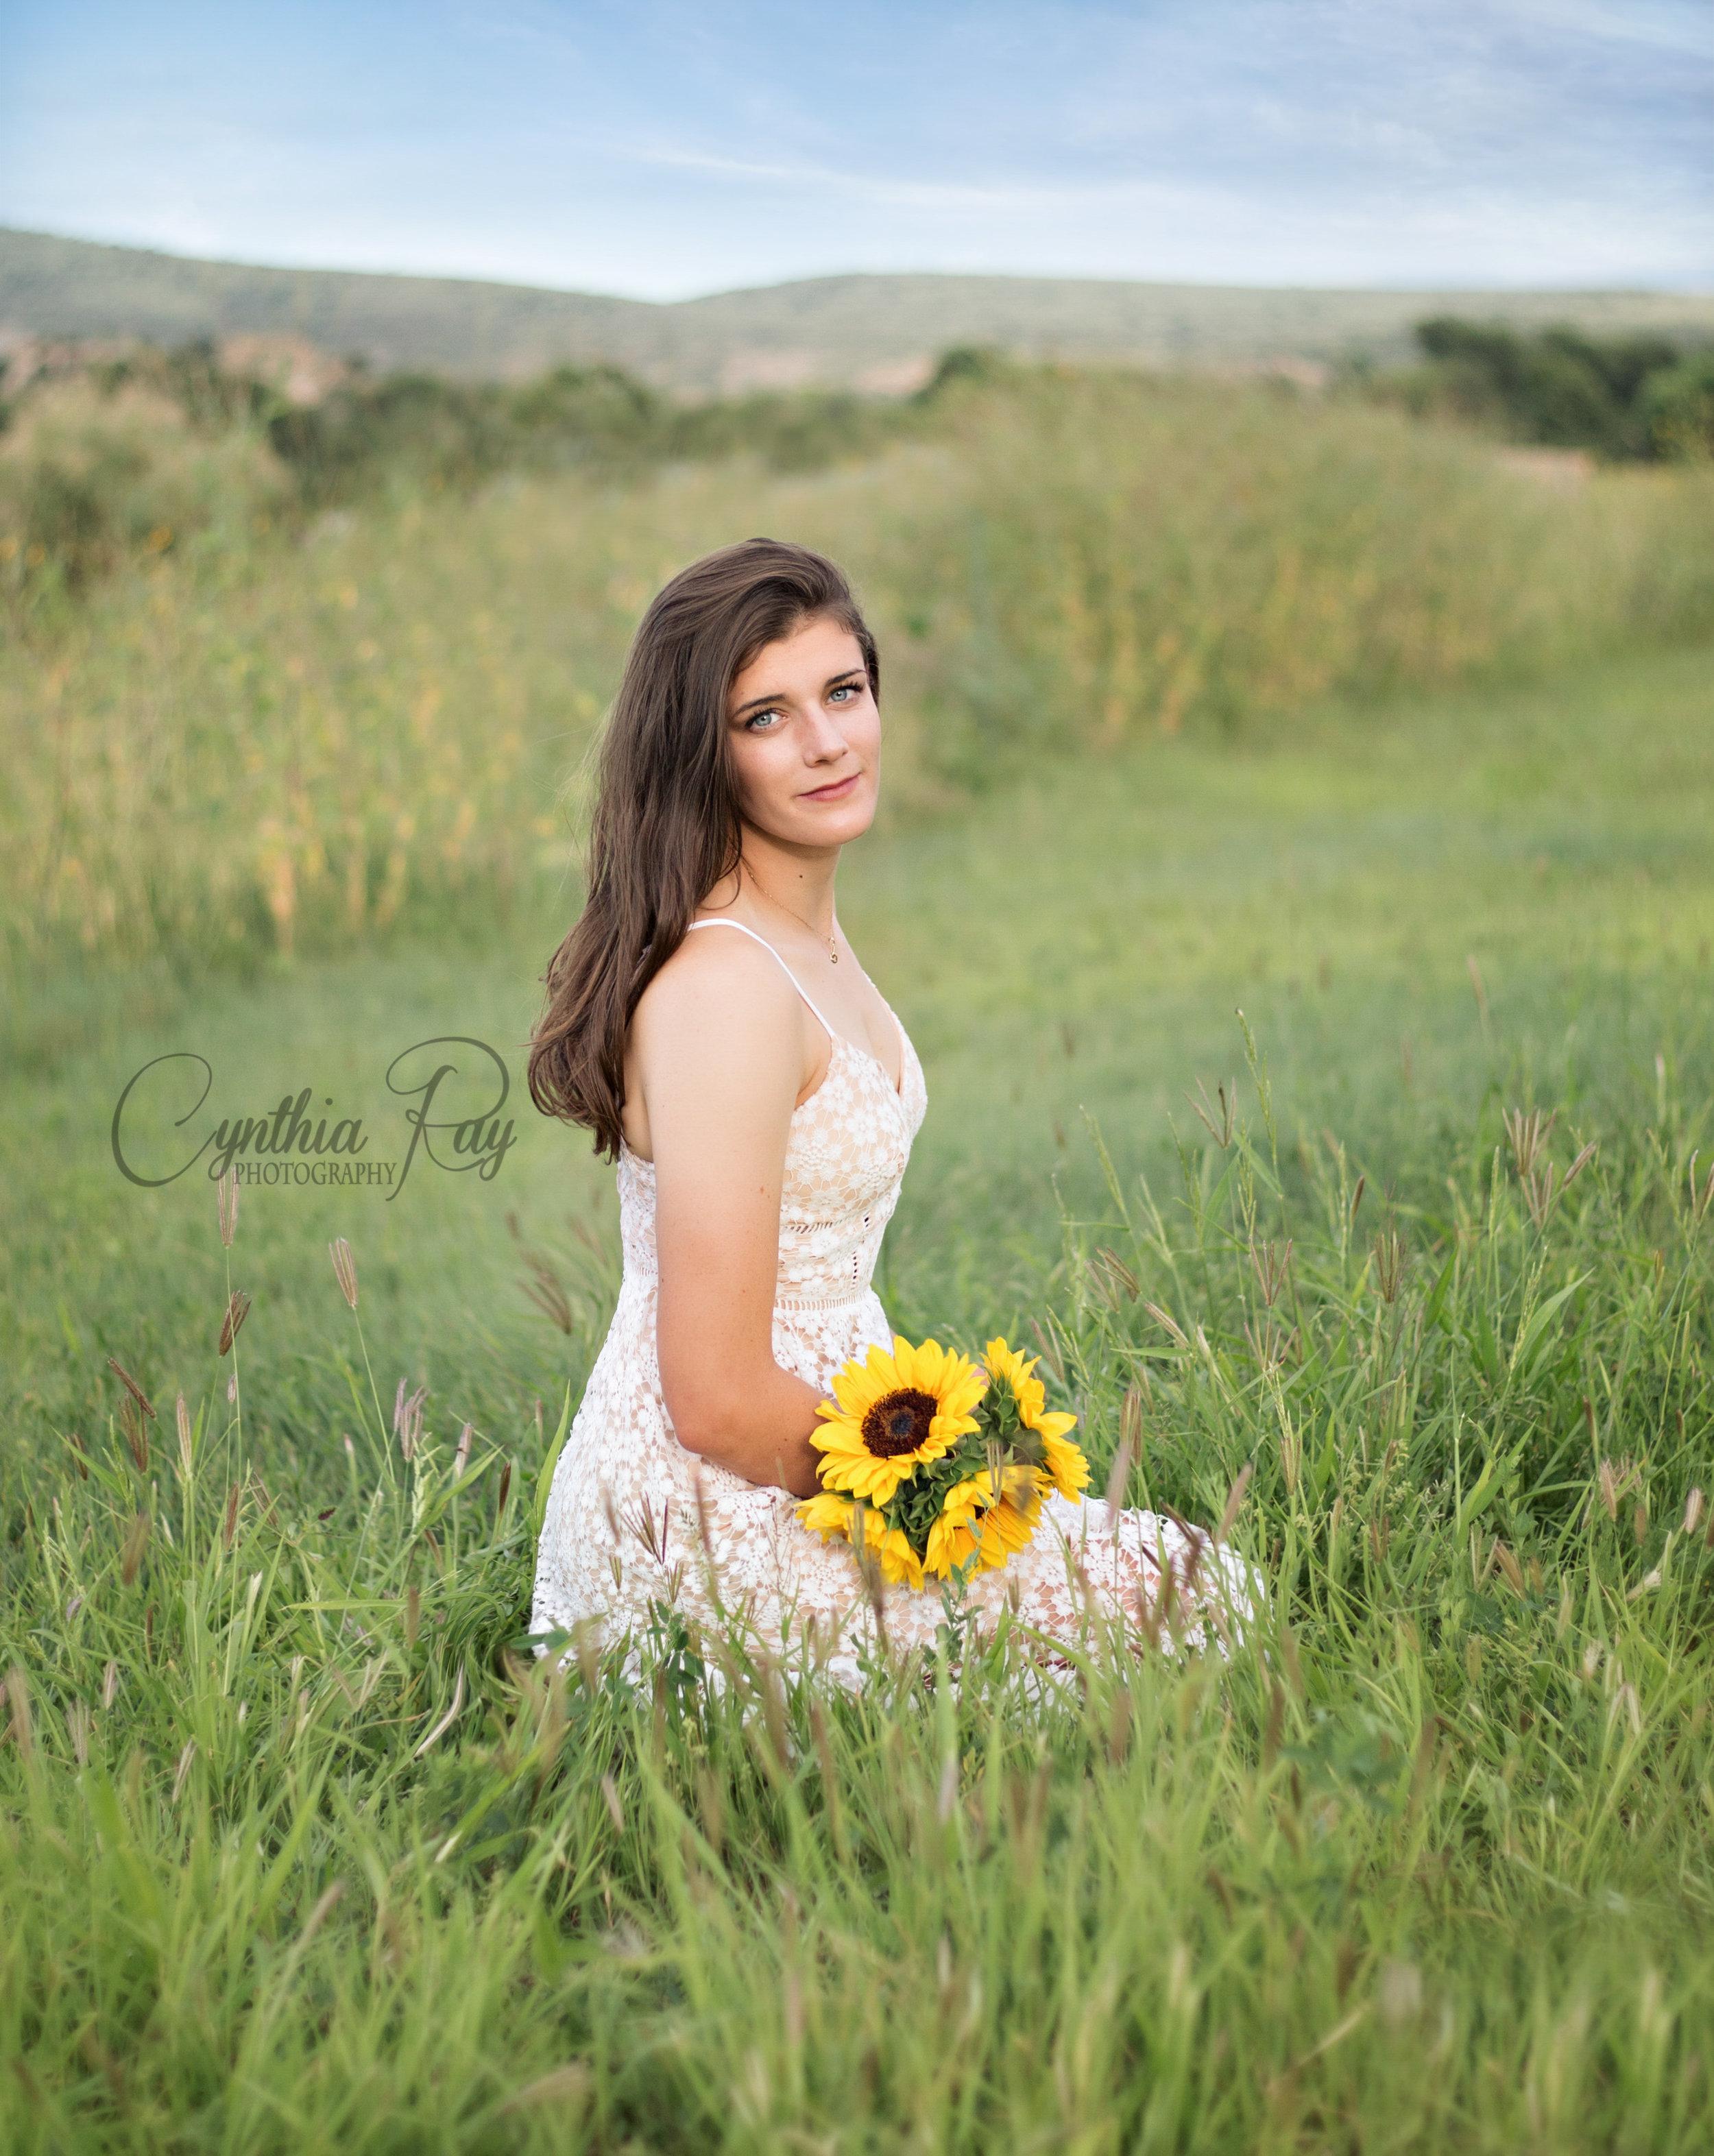 CynthiaRayPhotography_Cori_30.jpgpick.jpg